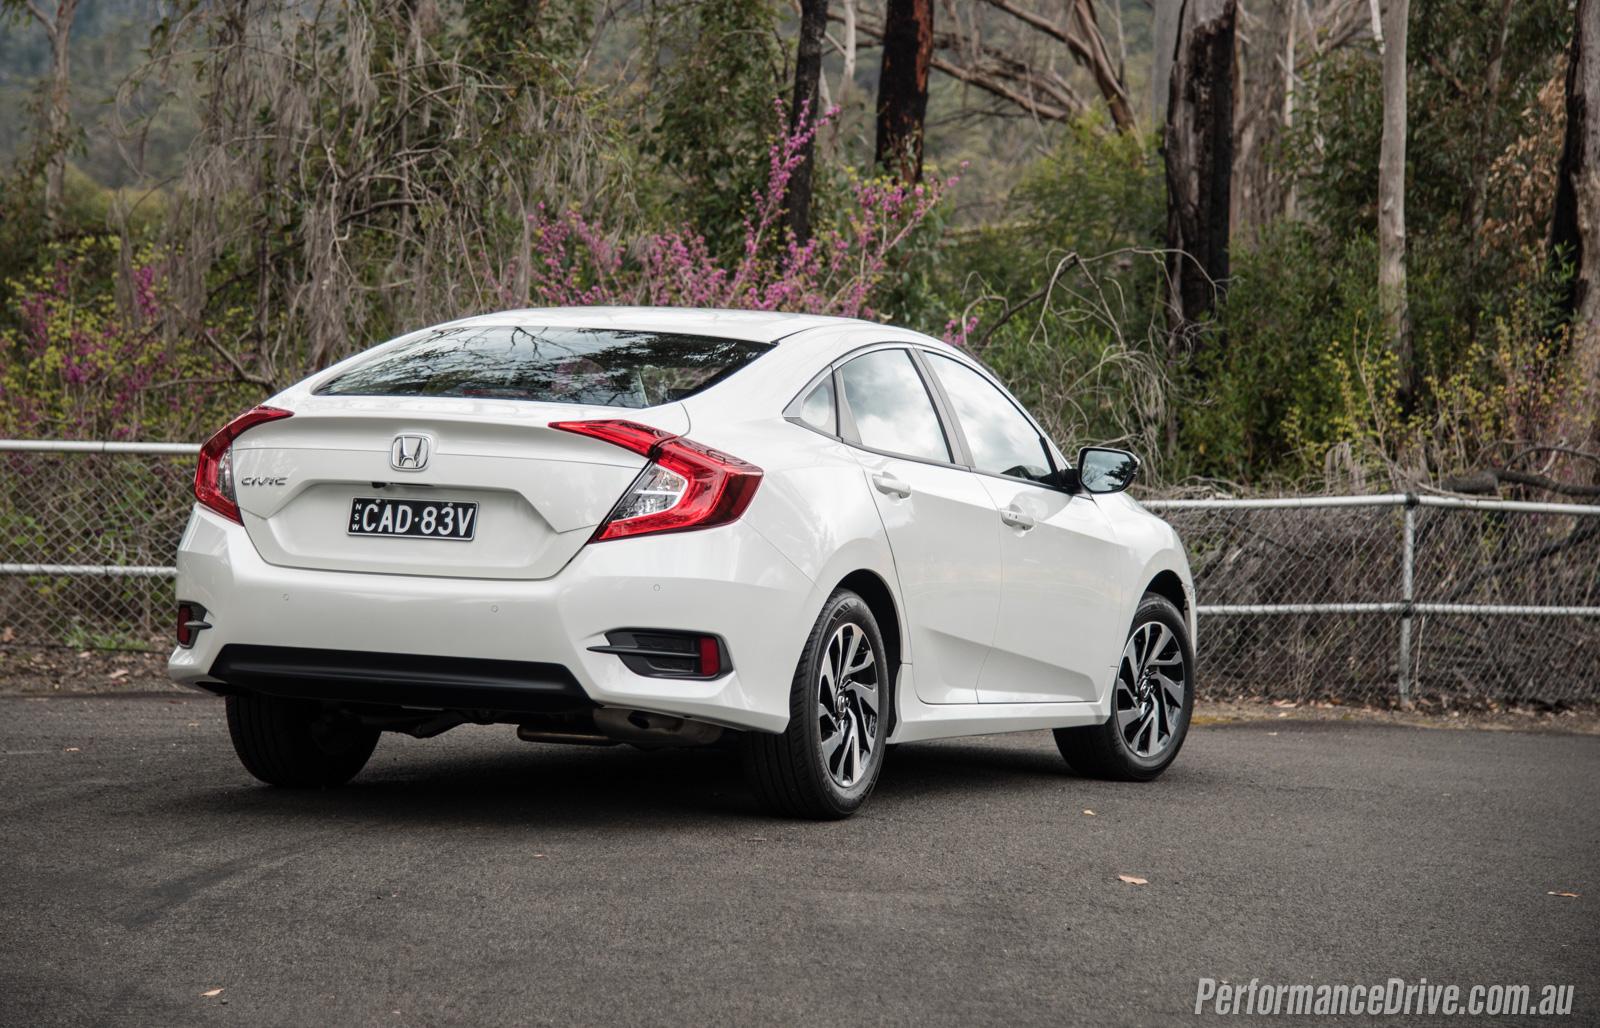 2016 Honda Civic VTi-S sedan review (video)   PerformanceDrive